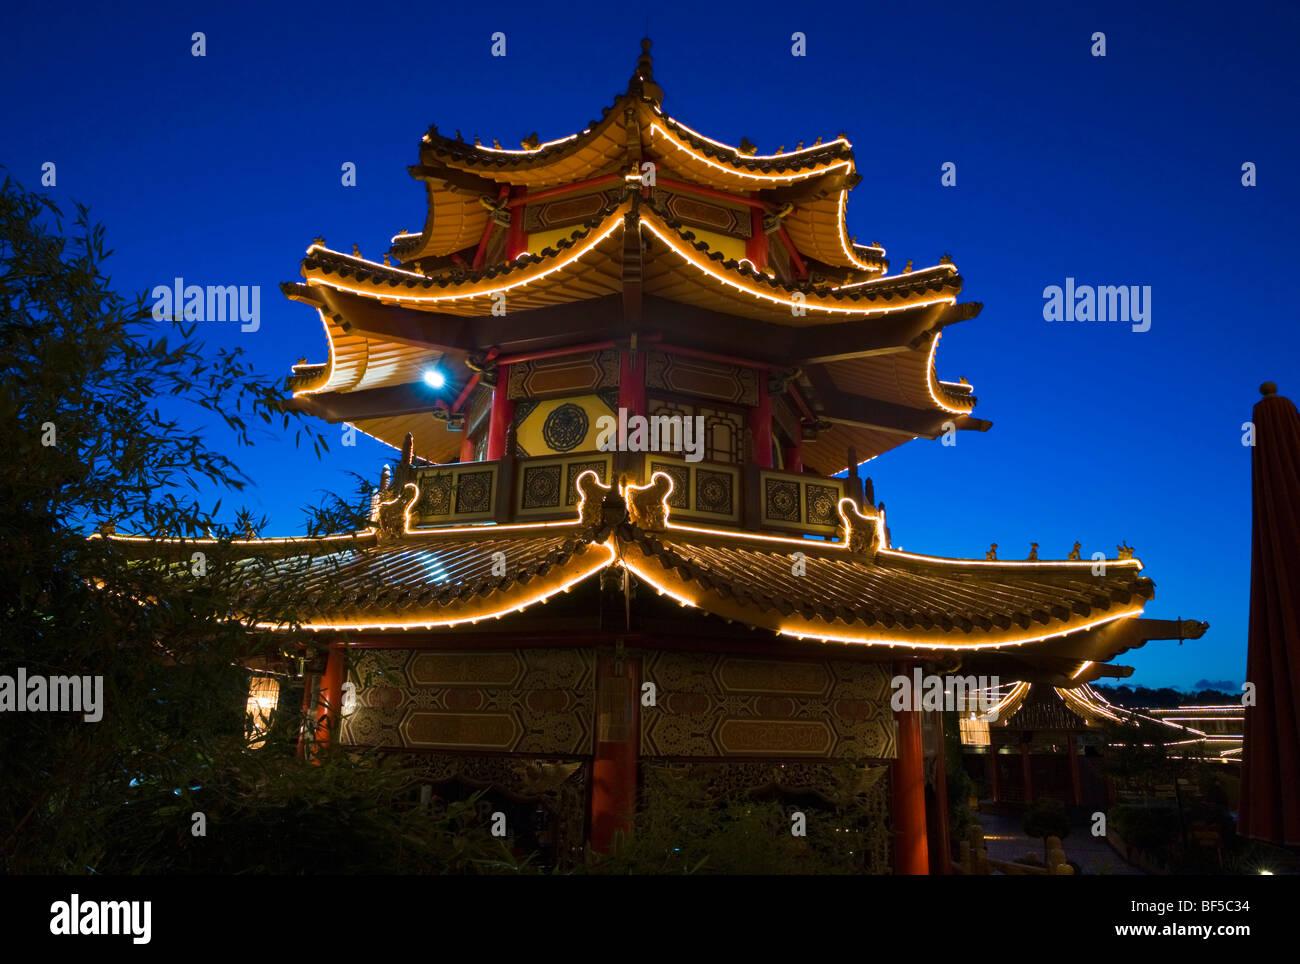 Pagoda, souvenir shop in Chinatown, Phantasialand, Bruehl, Nordrhein-Westfalen, Germany, Europe Stock Photo